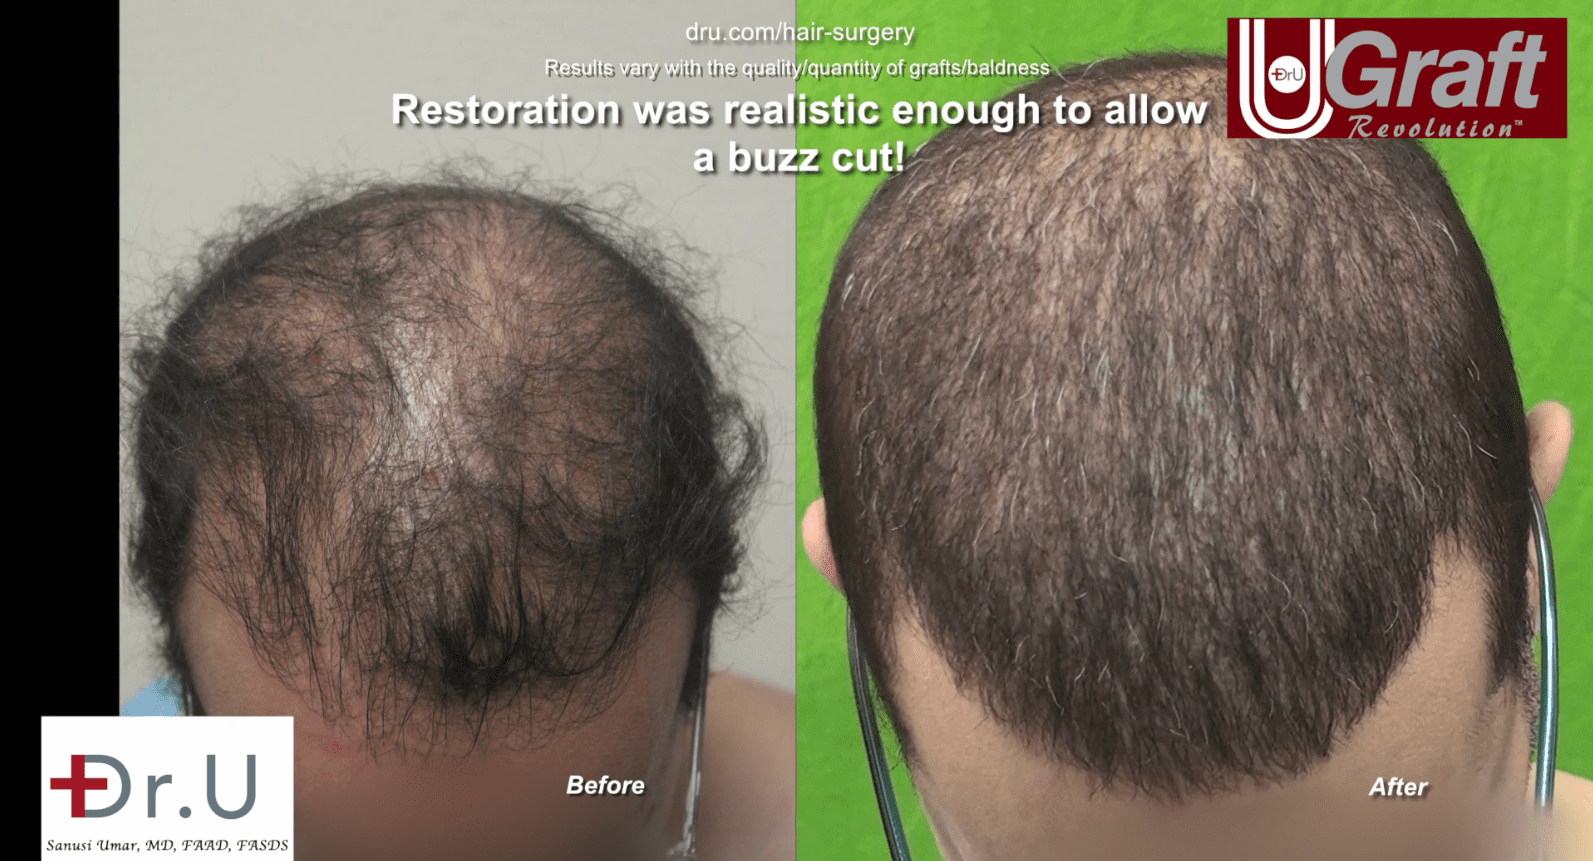 Dr. Umar's hair transplant using beard hair restores NW6 hair loss successfully